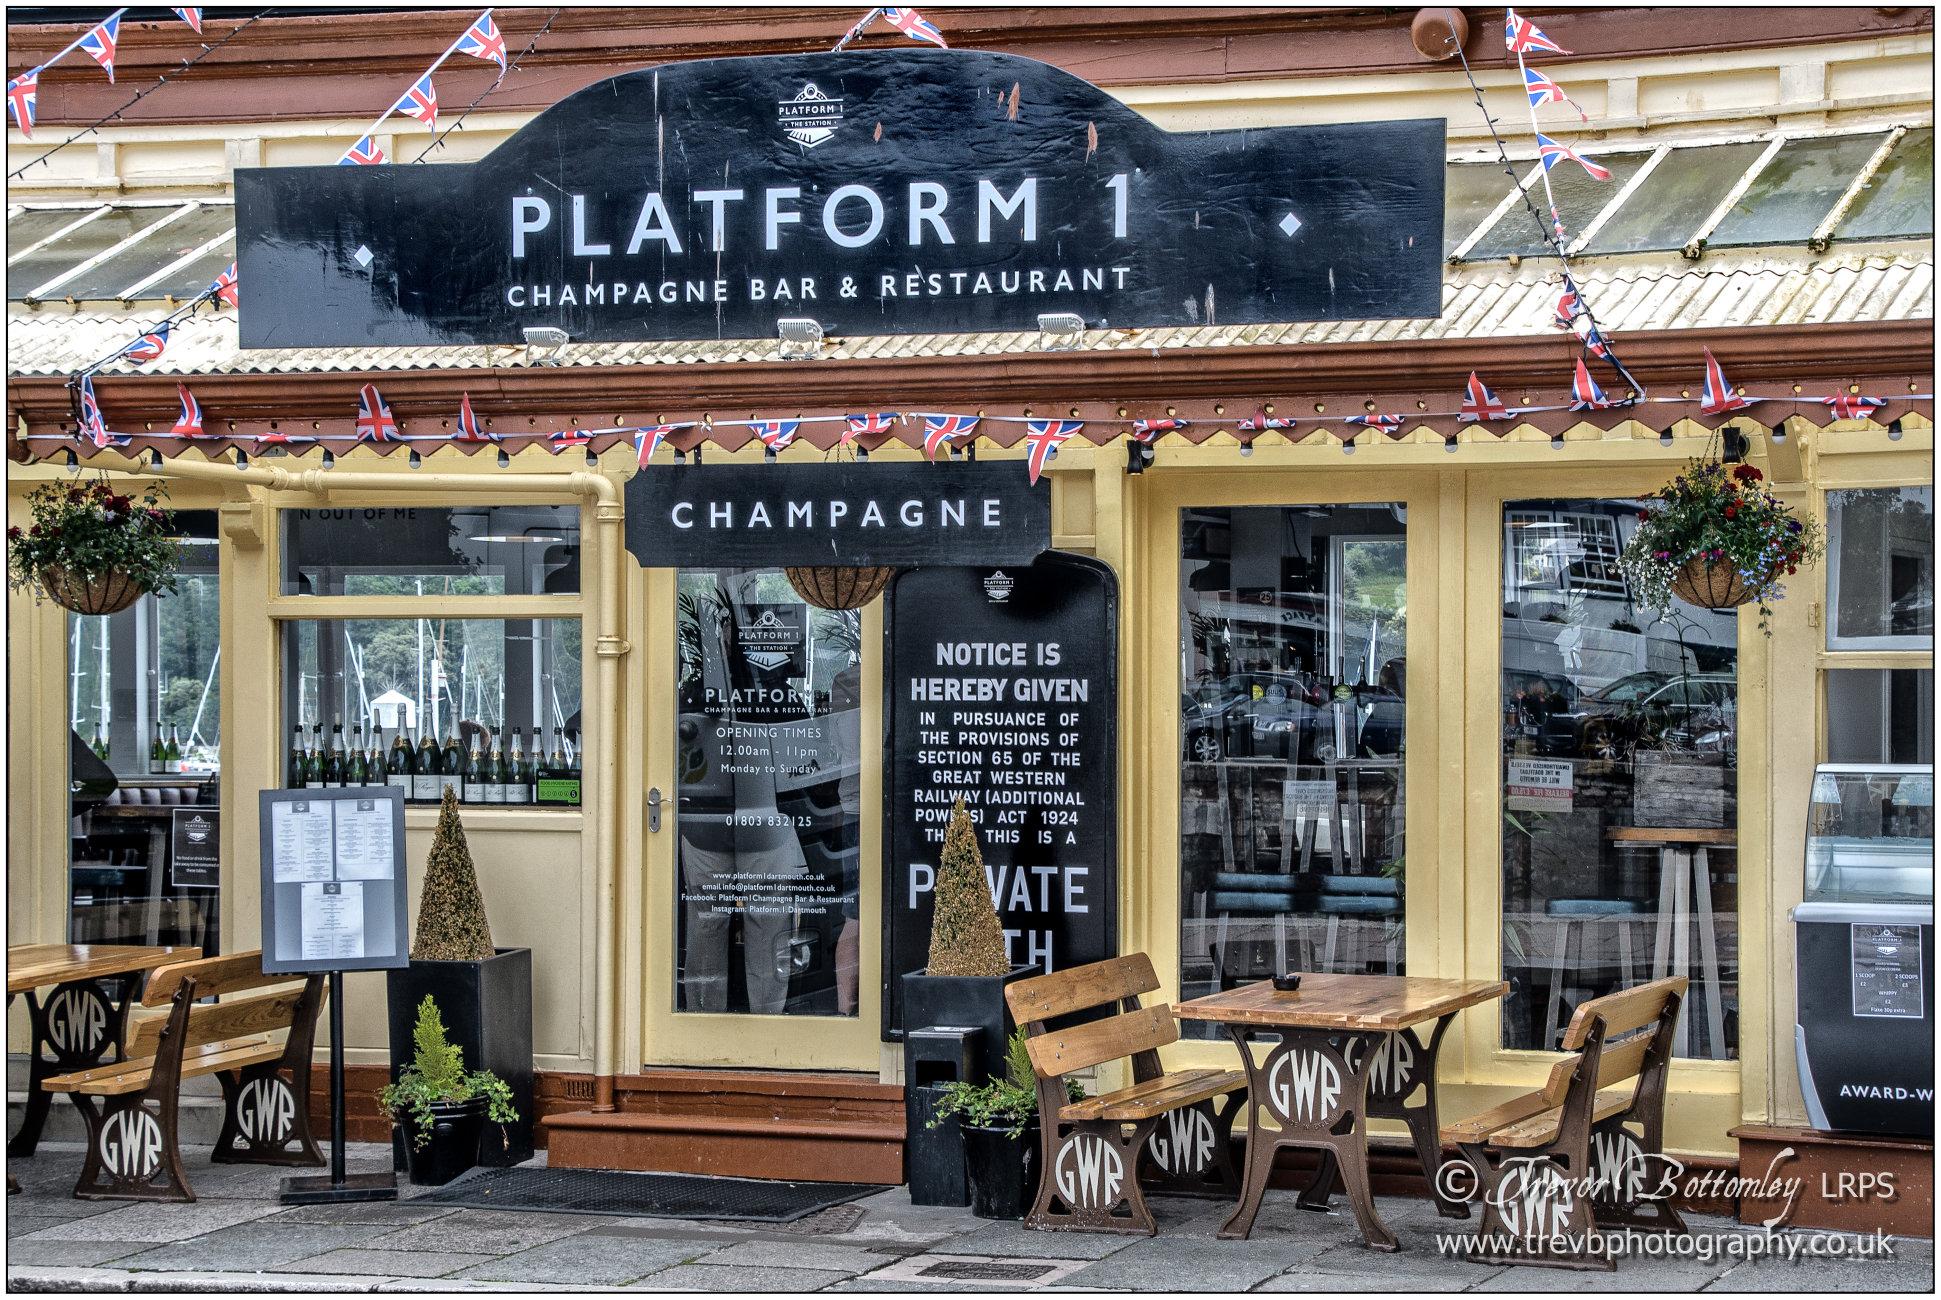 'Platform 1 Champagne Bar & Restaurant'